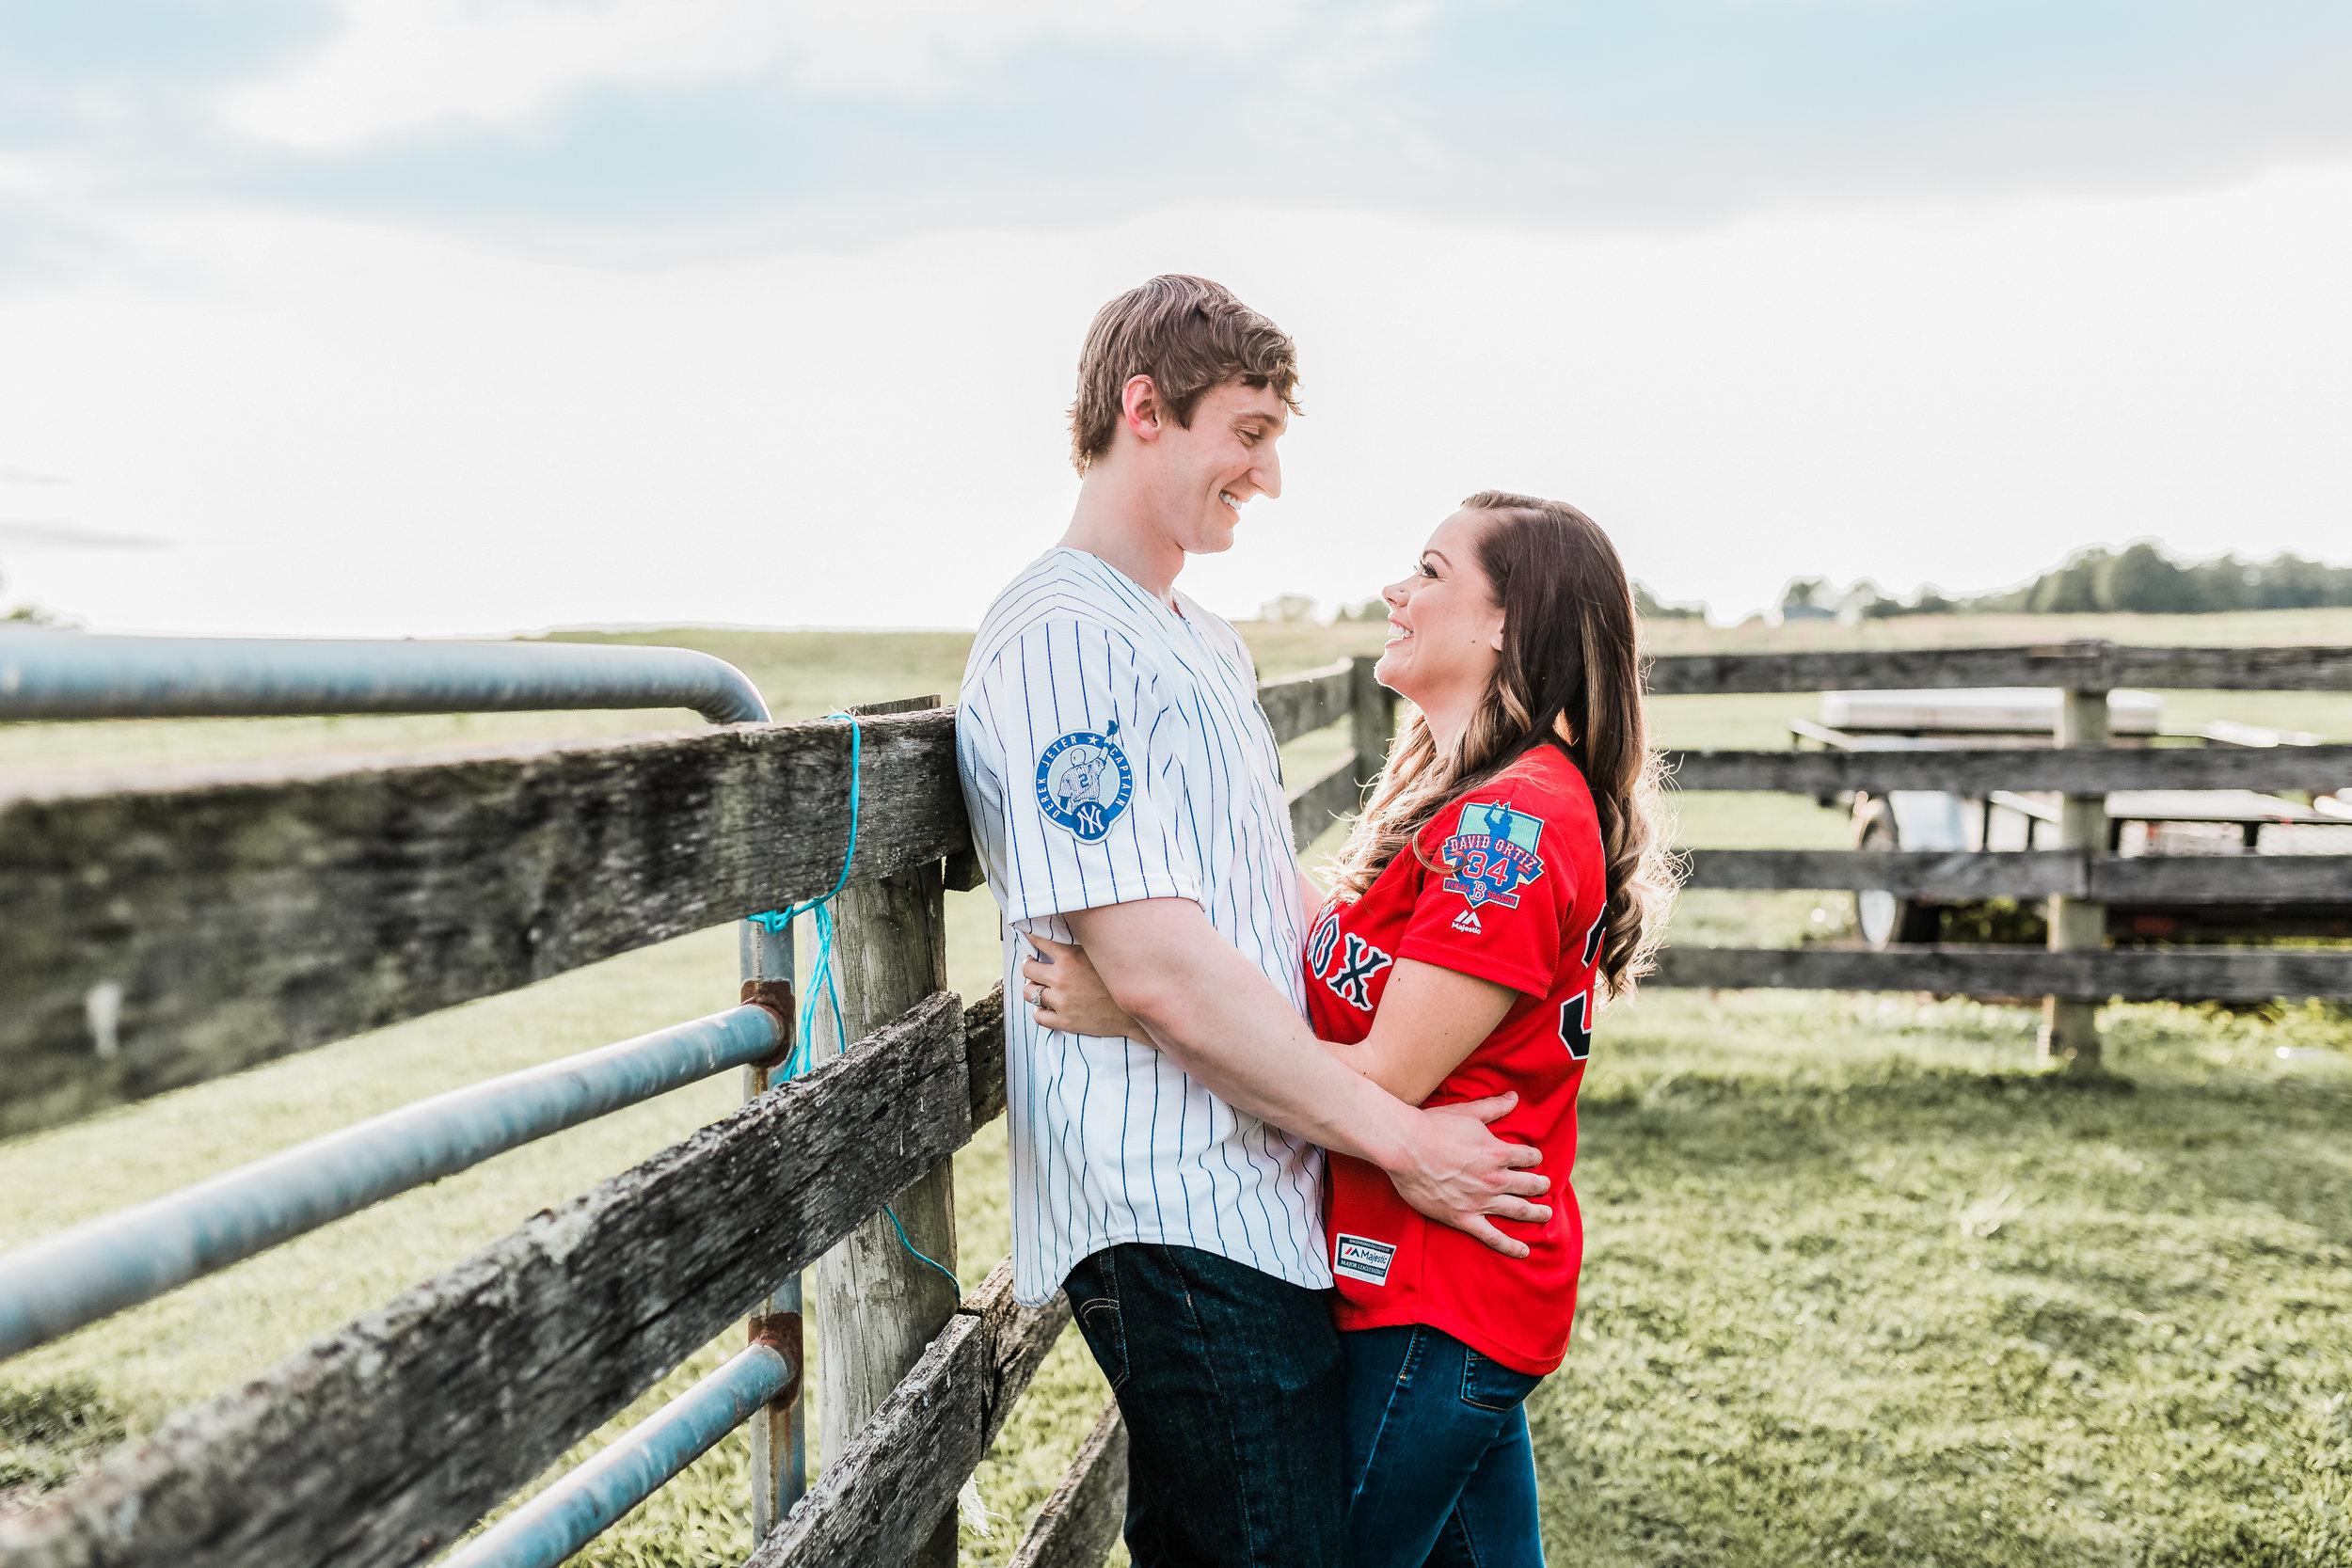 Engagement session couple smiling baseball jerseys